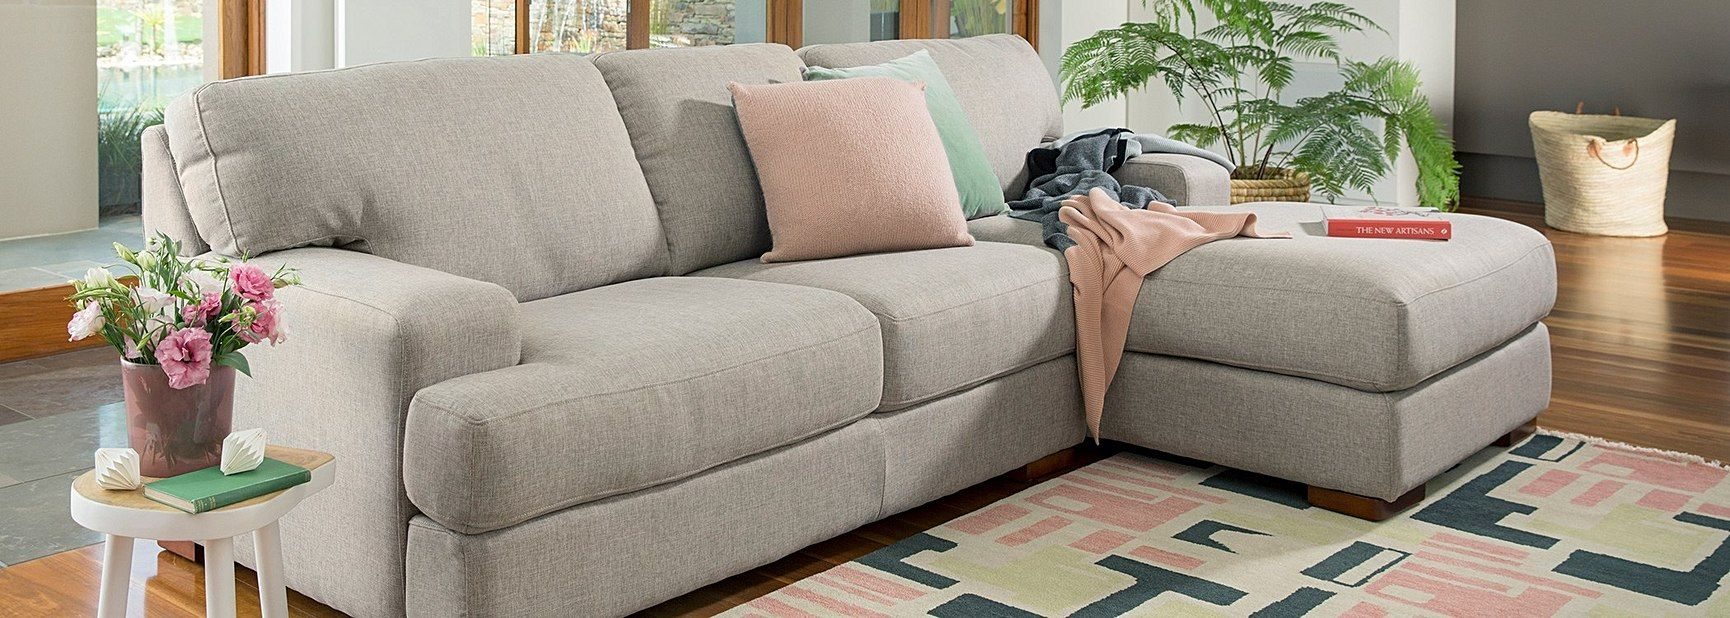 Sofas Lounge Suites Leather Sofa Fabric Sofas Plush Furniture Plush Sofa Living Room Furniture Layout Home Decor Online